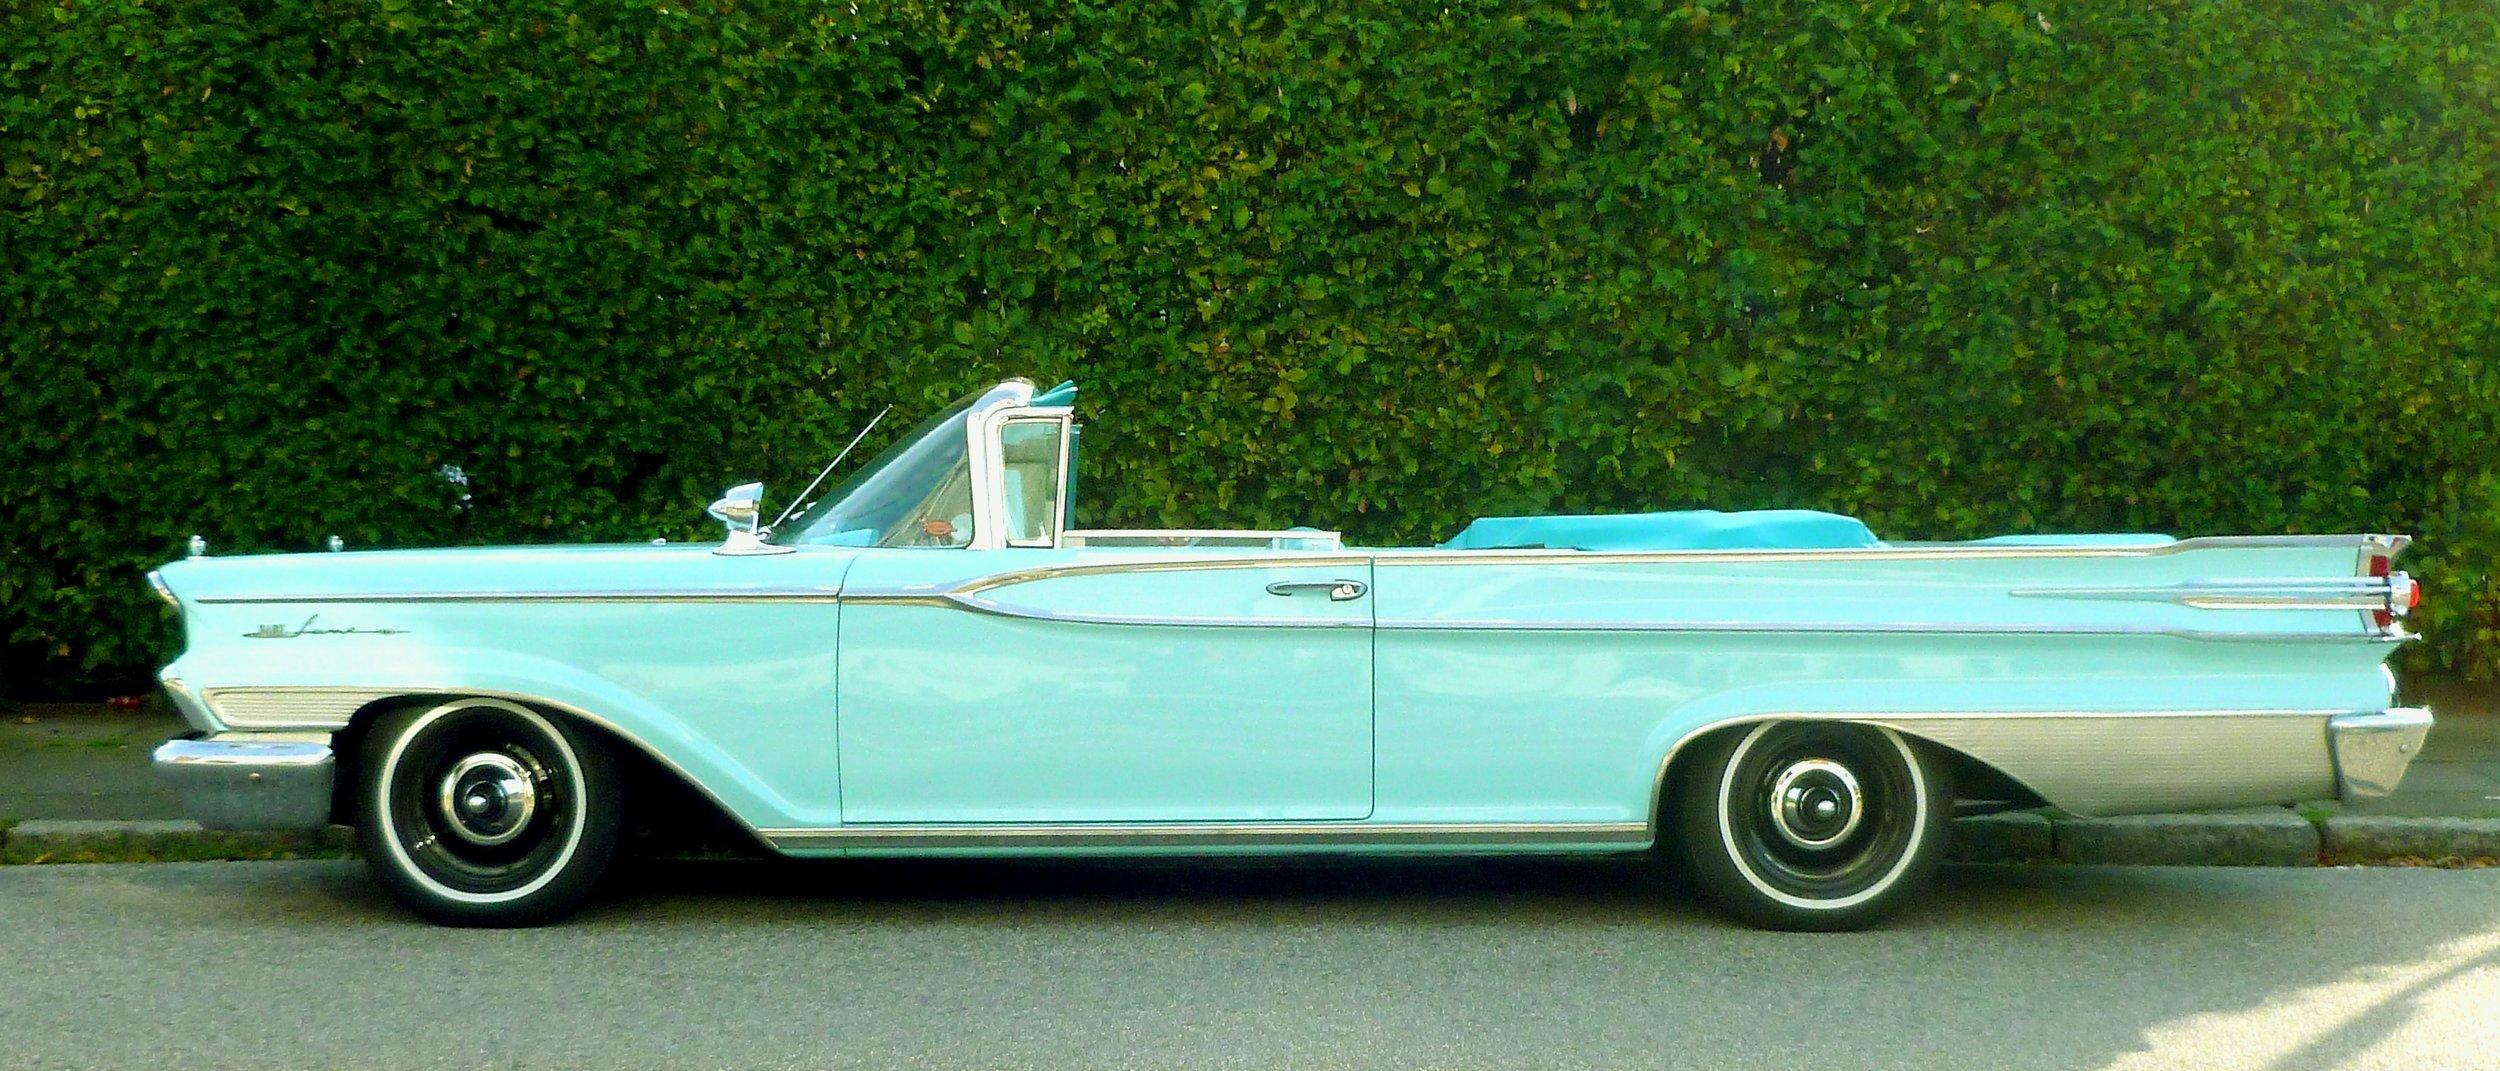 american-car-auto-automobile-210058.jpg